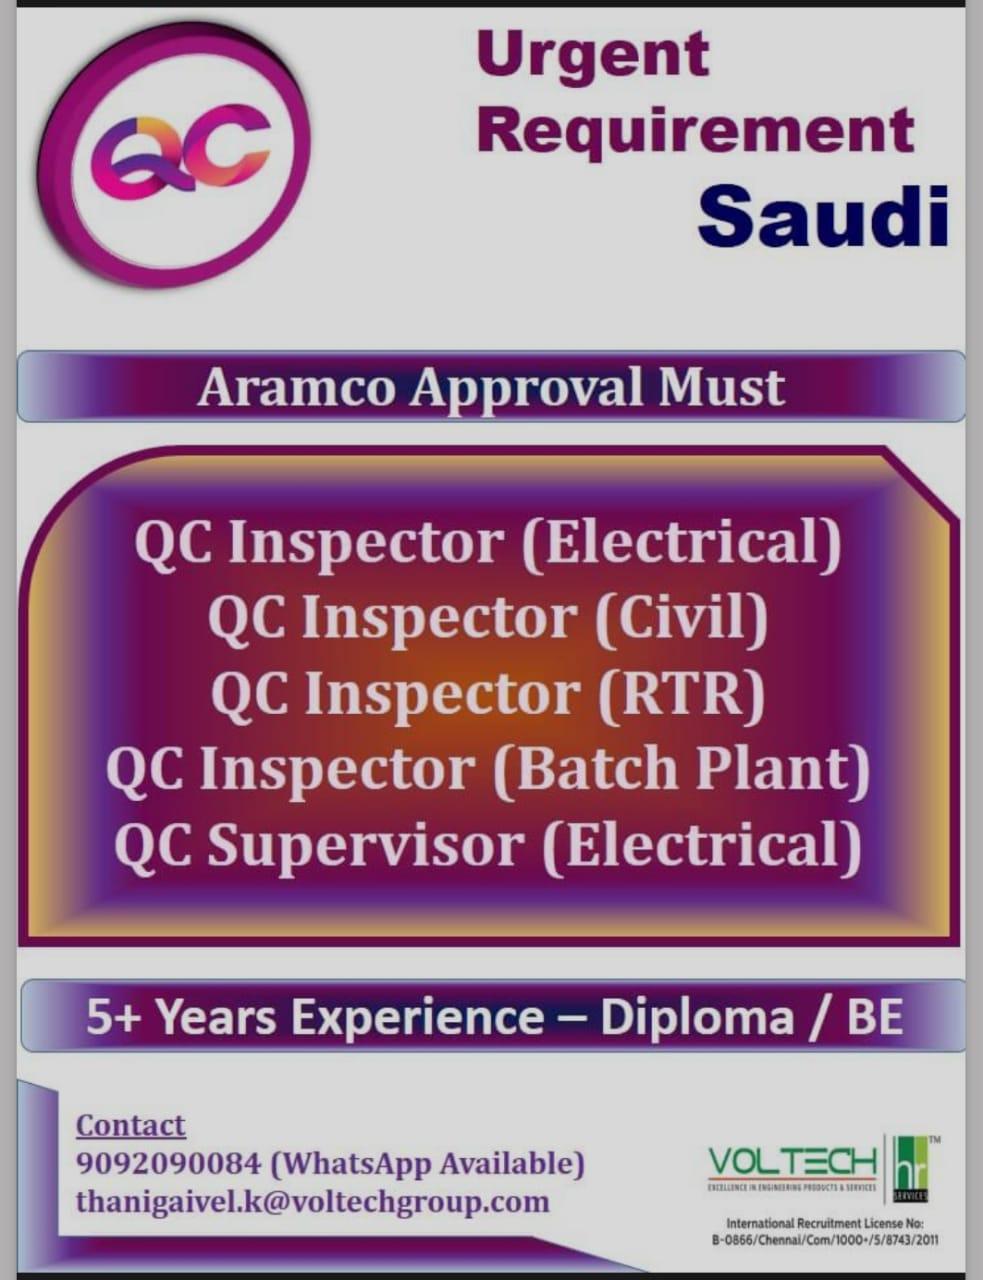 Urgent Requirement for a leading company-Saudi Arabia